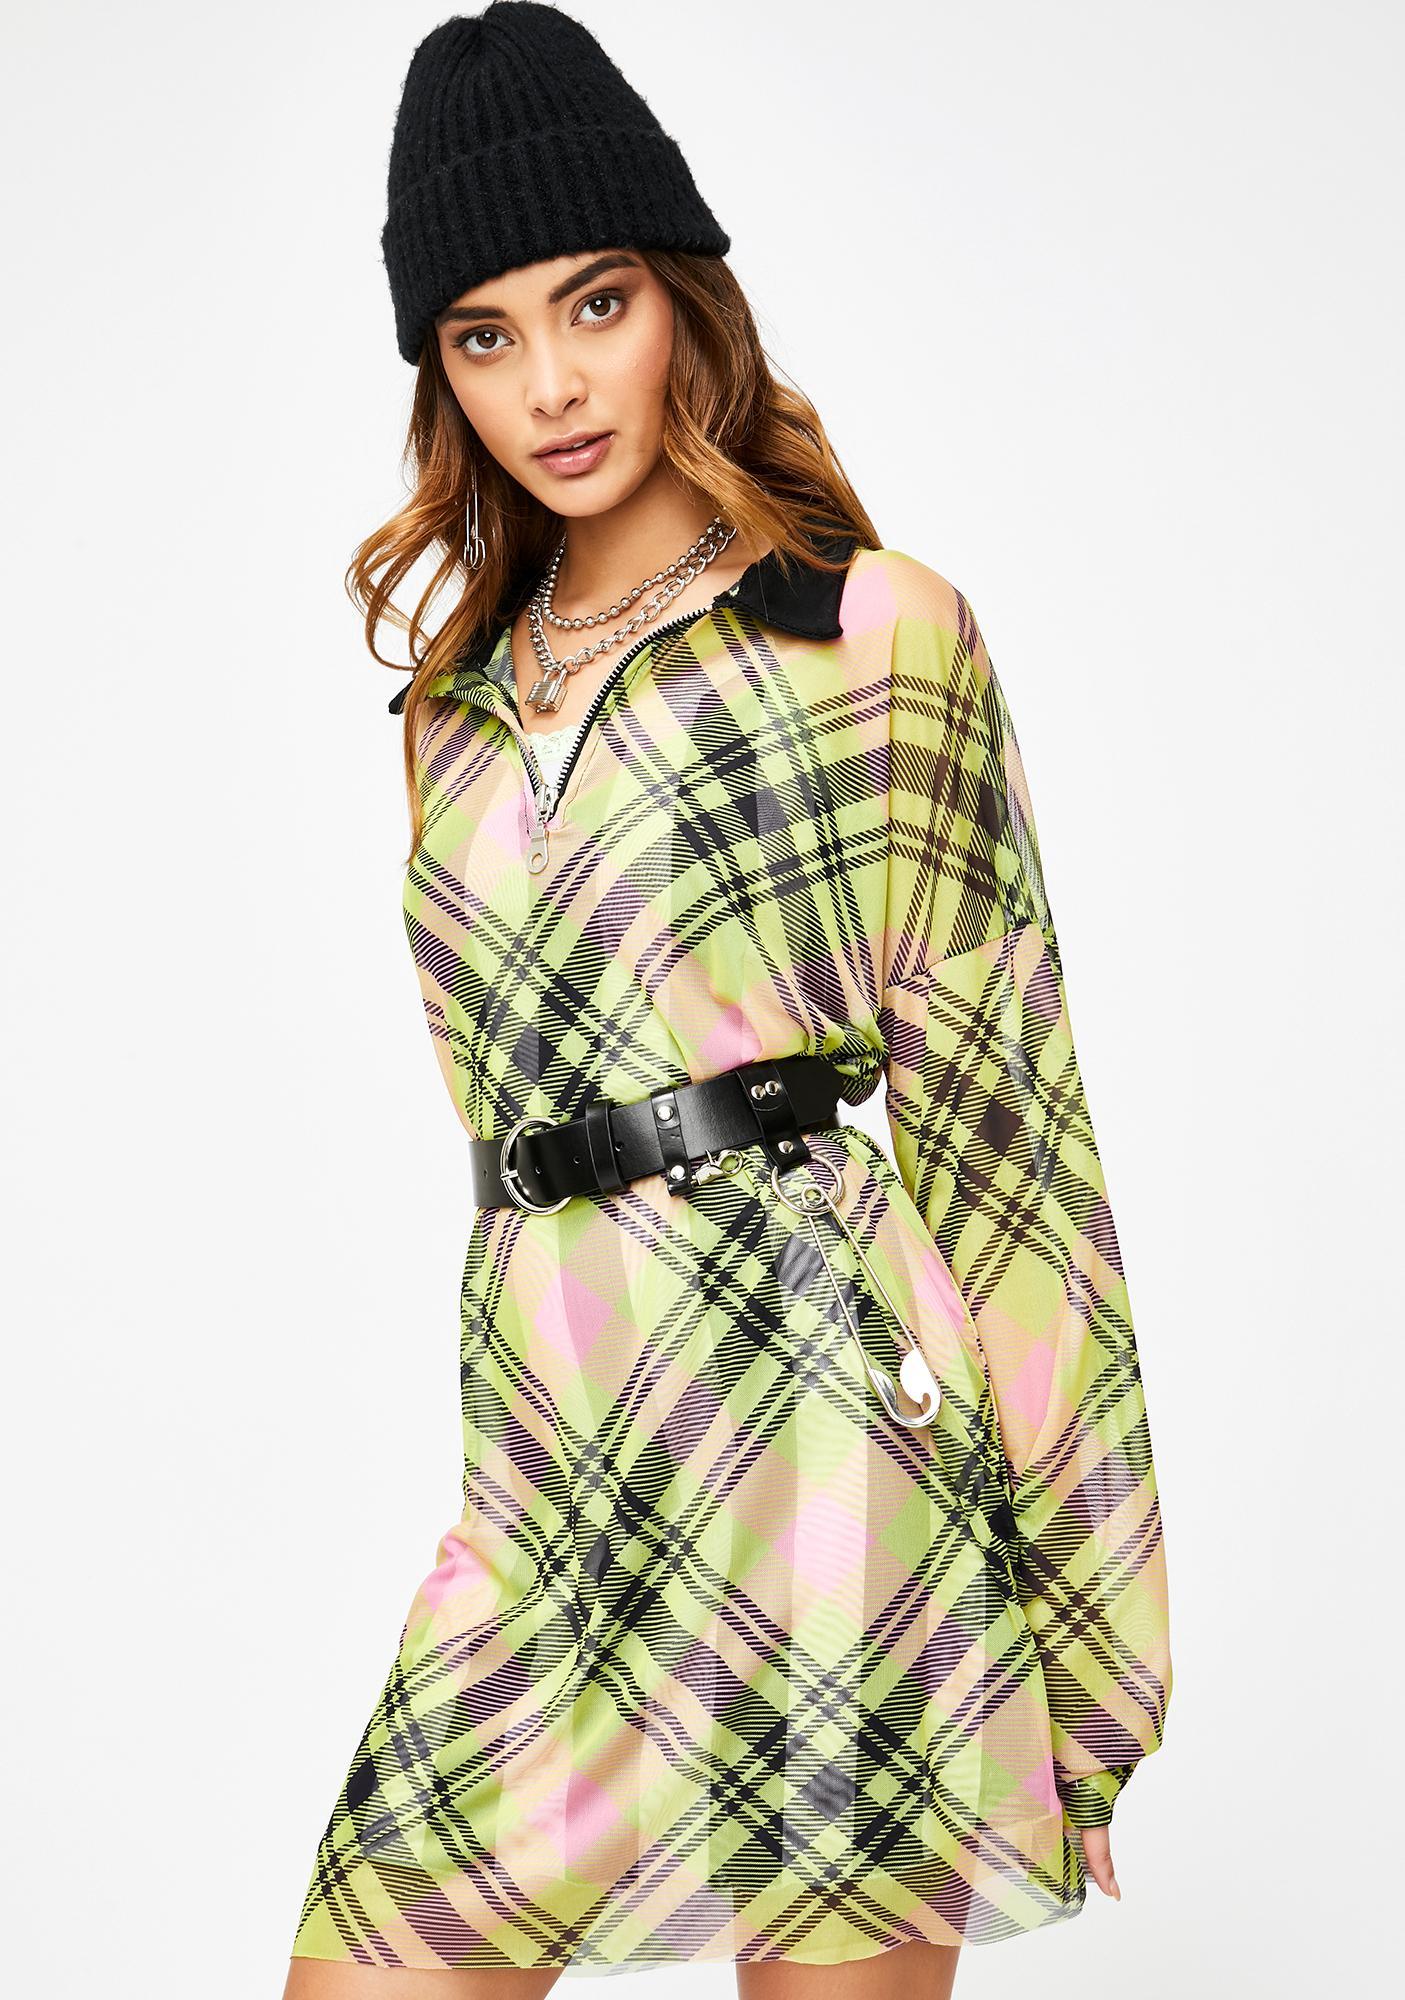 The Ragged Priest Steady Shirt Dress